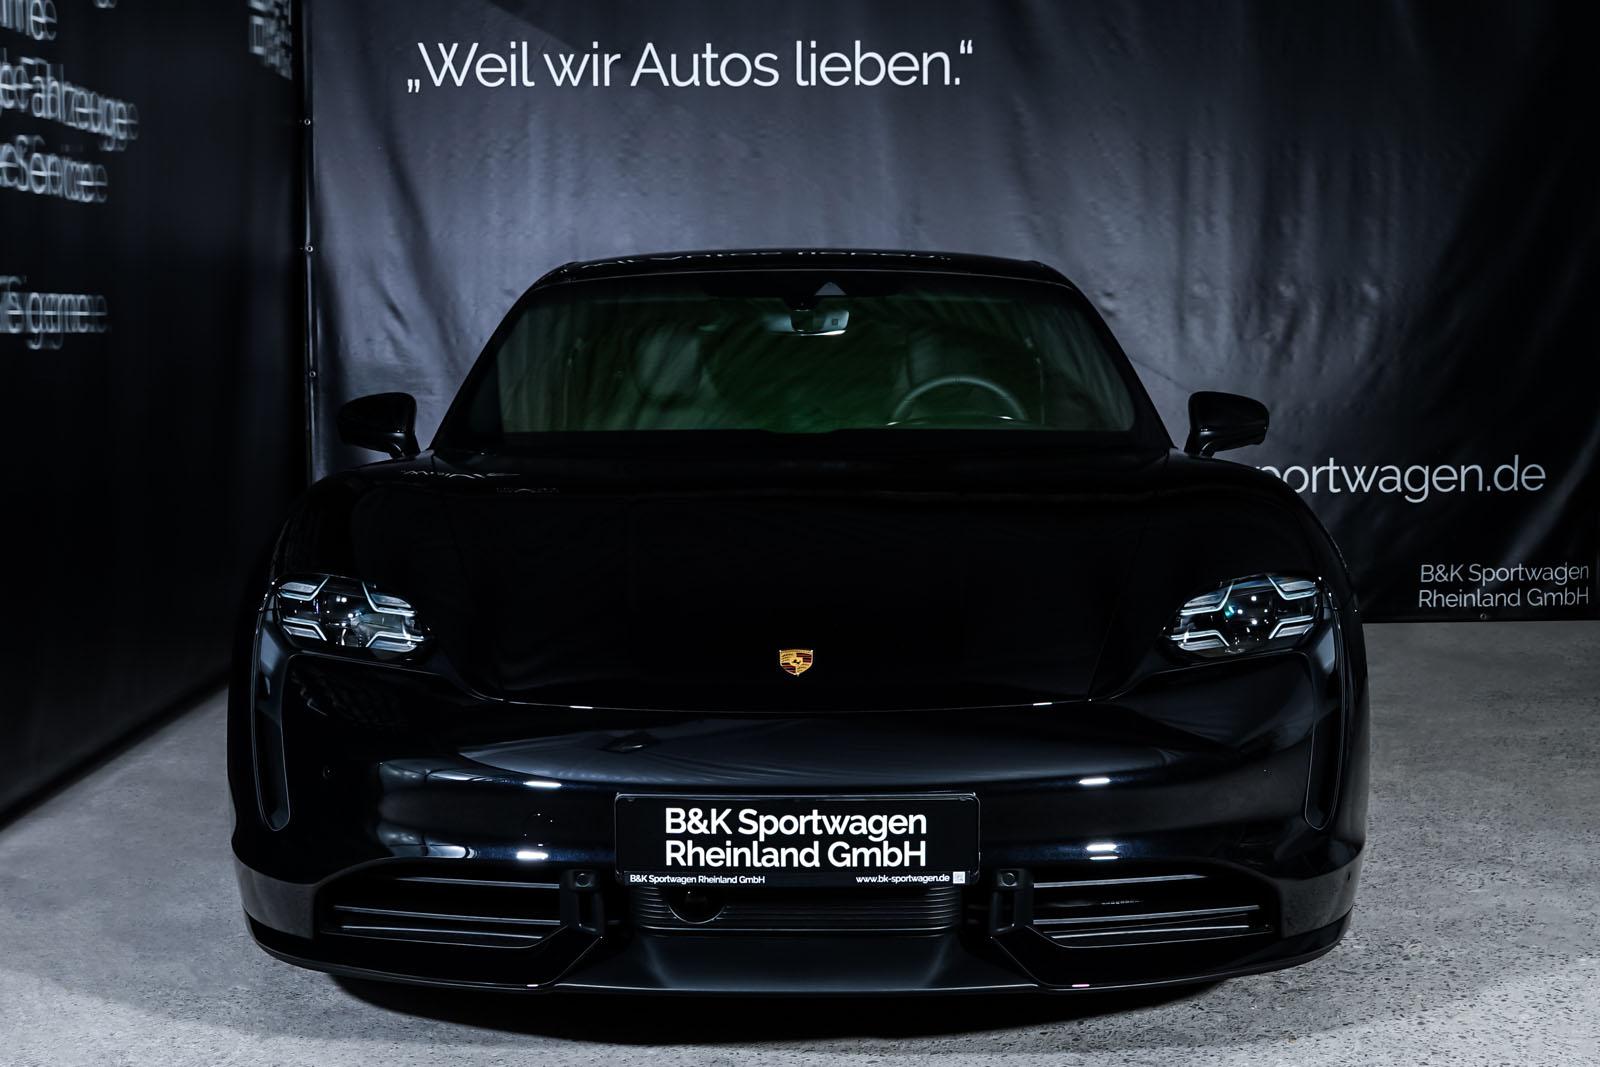 Porsche_Taycan_Turbo_Schwarz_Schwarz_POR-8106_1_w